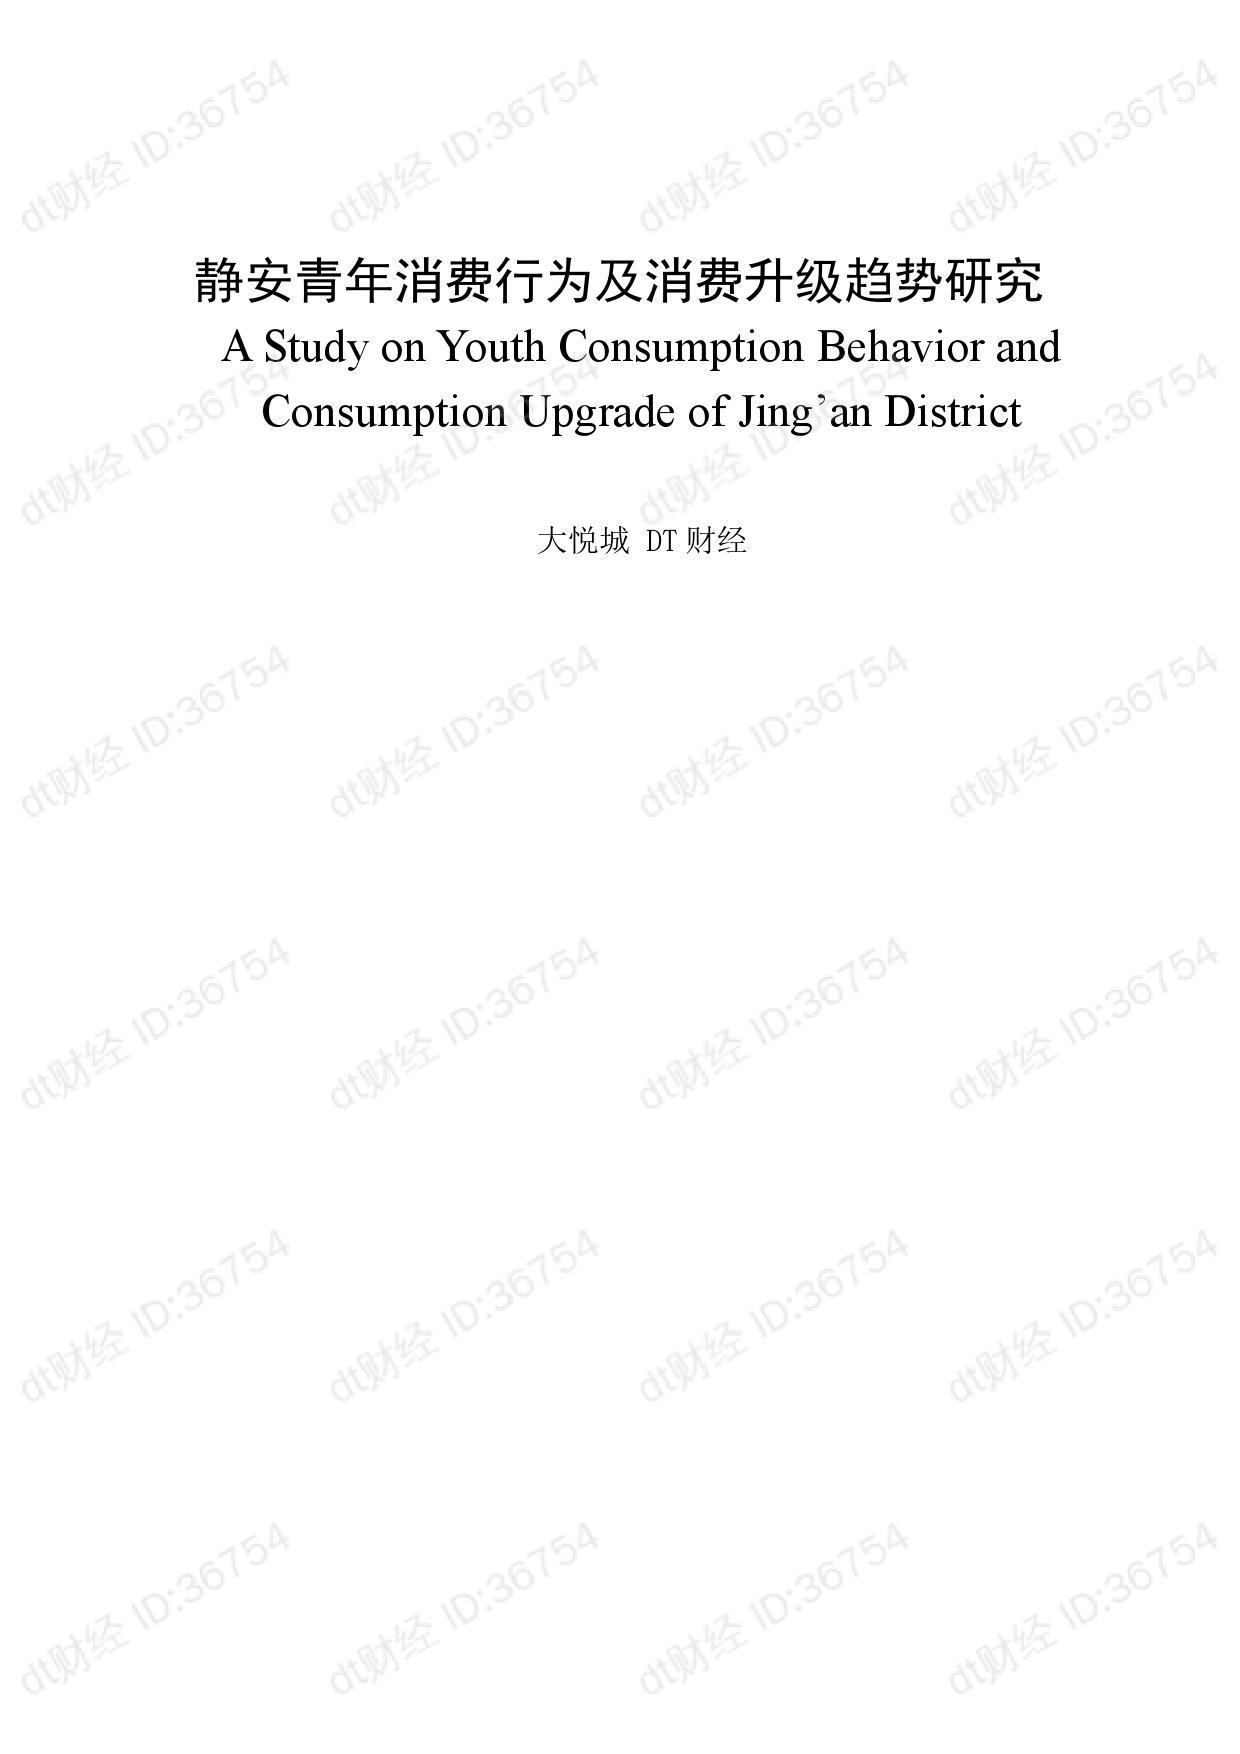 DT财经:静安青年消费行为及消费升级趋势研究(附下载)